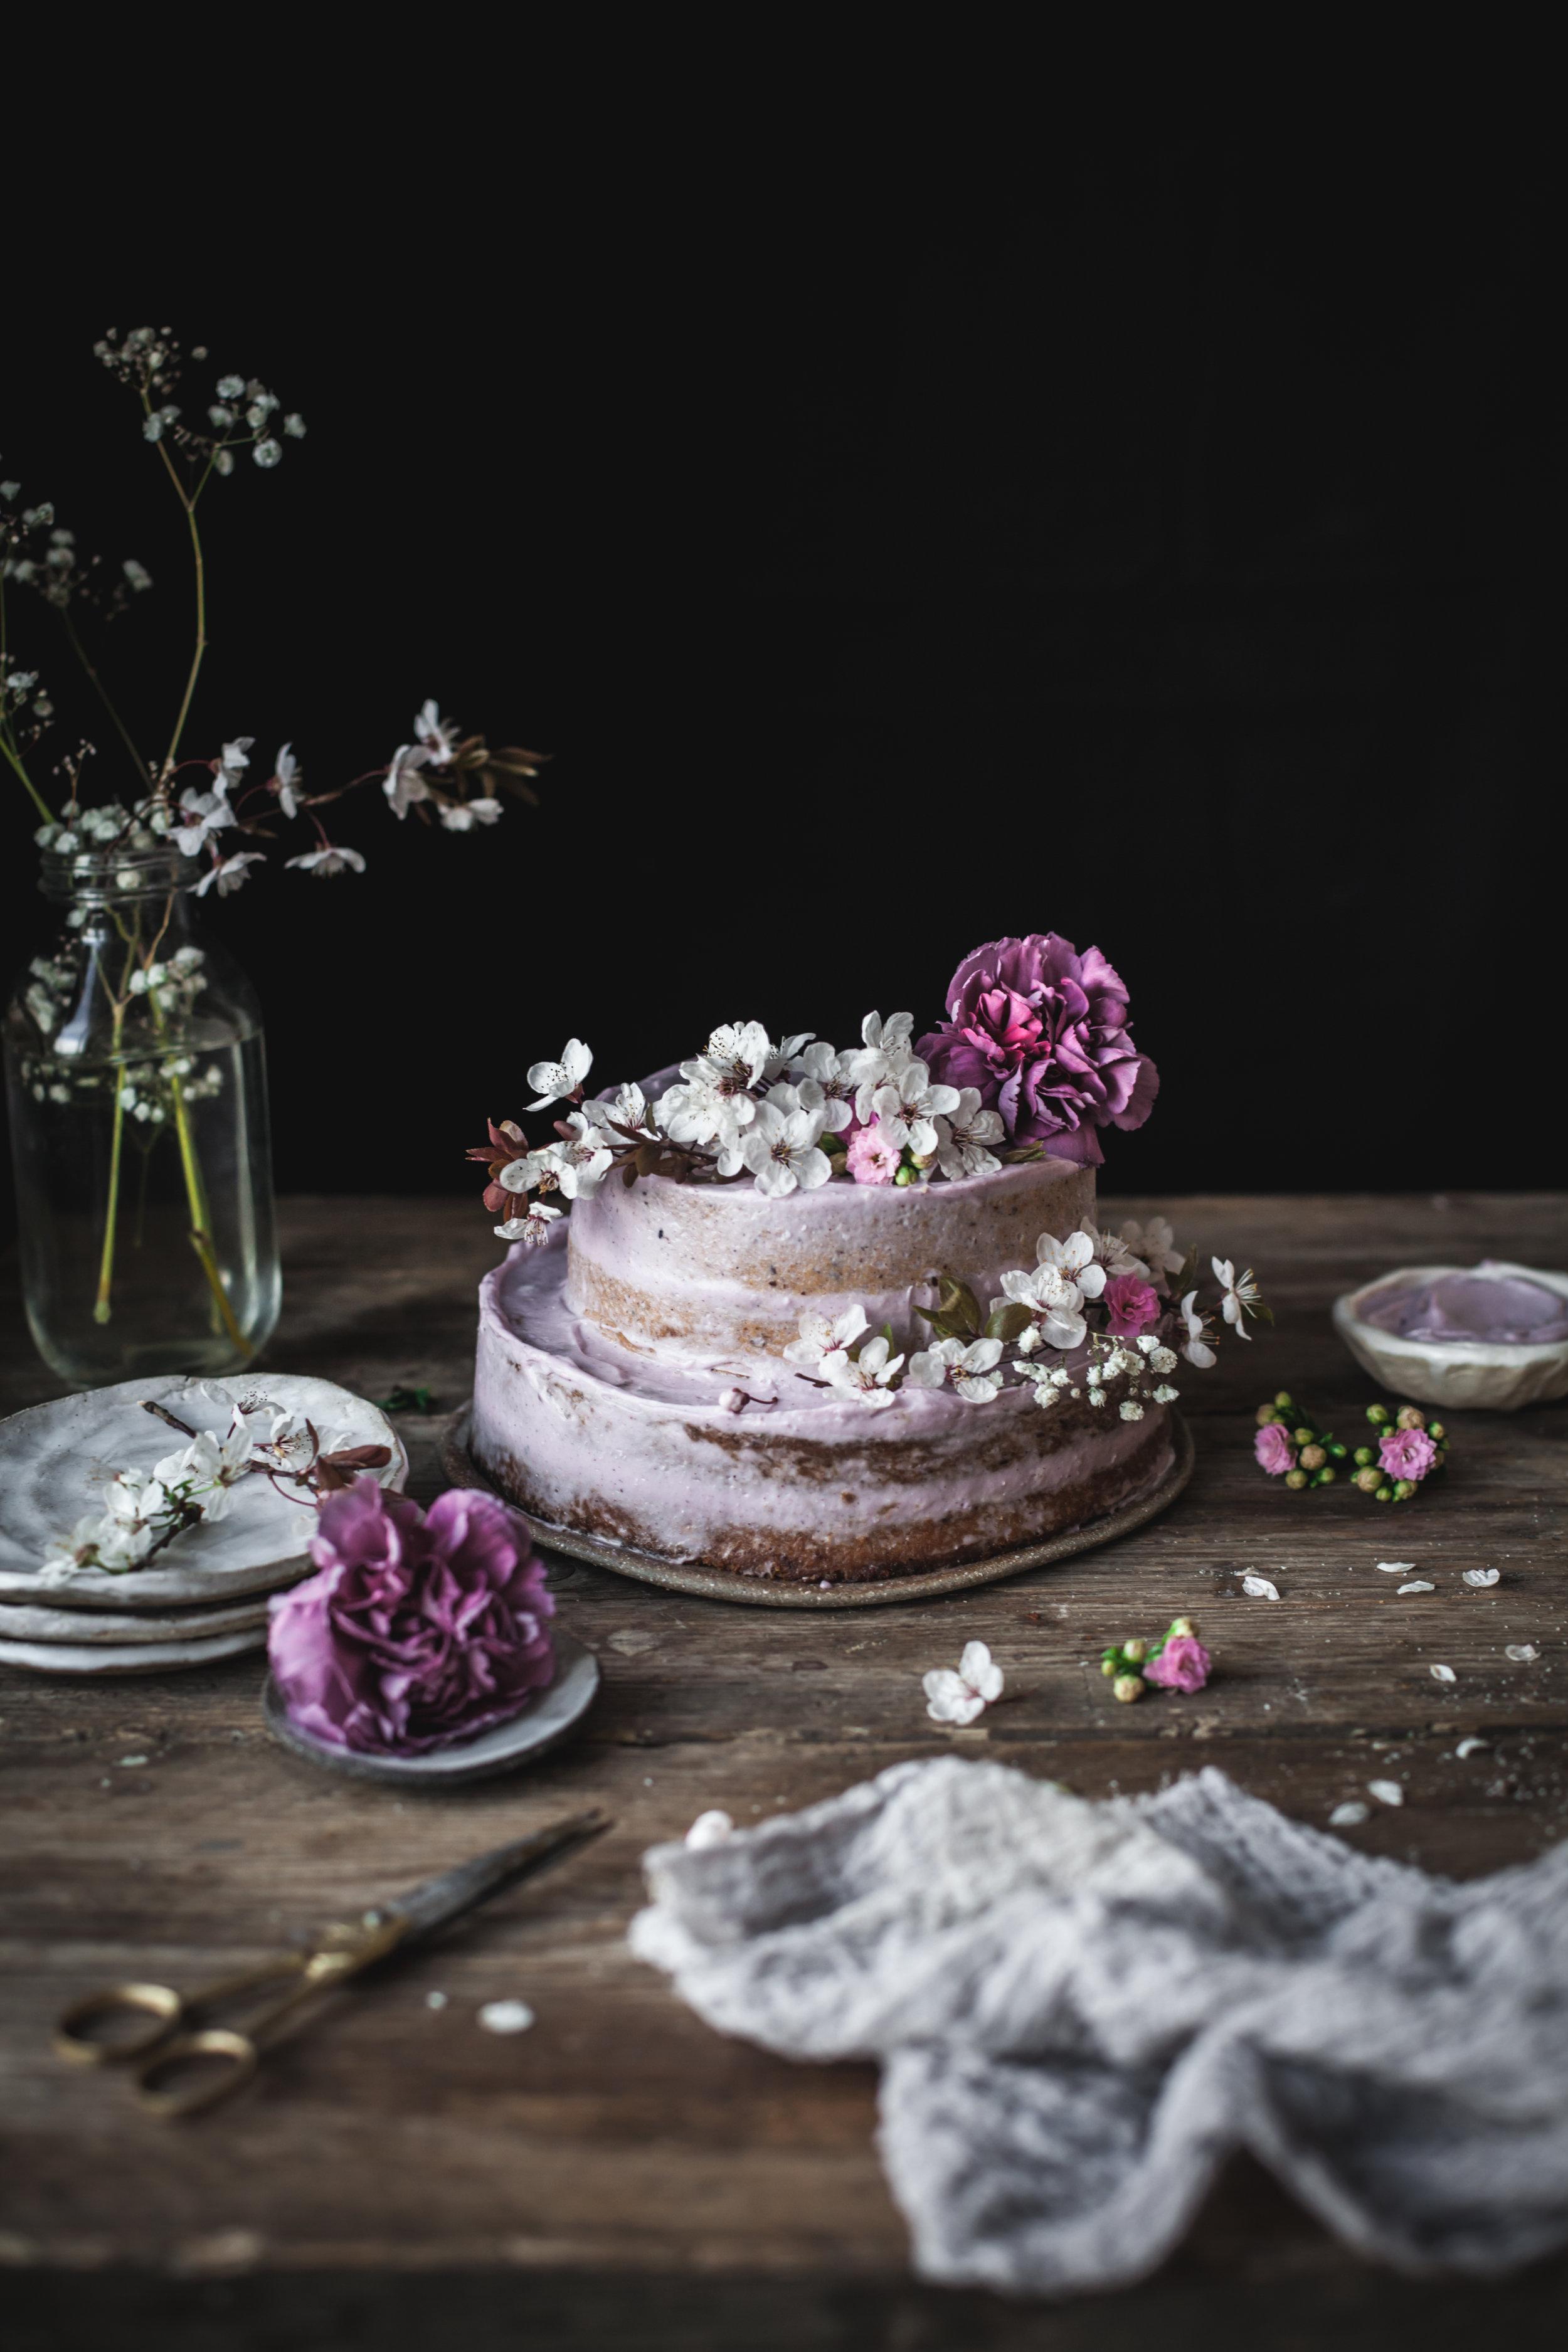 emon lavender cake